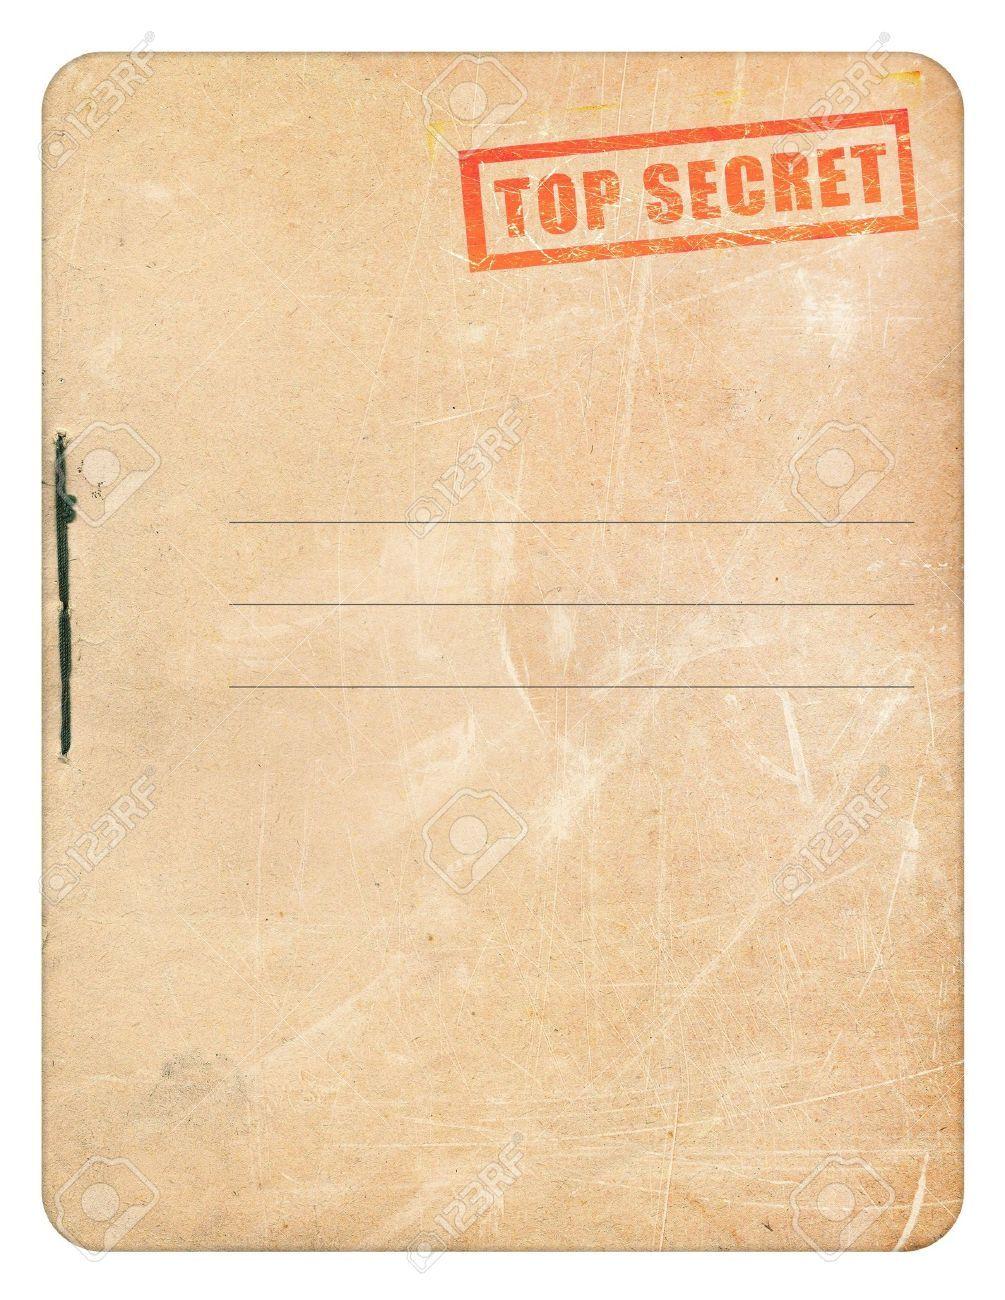 Top Secret Folder Template Free Download Folder Templates Paper City Printable Templates